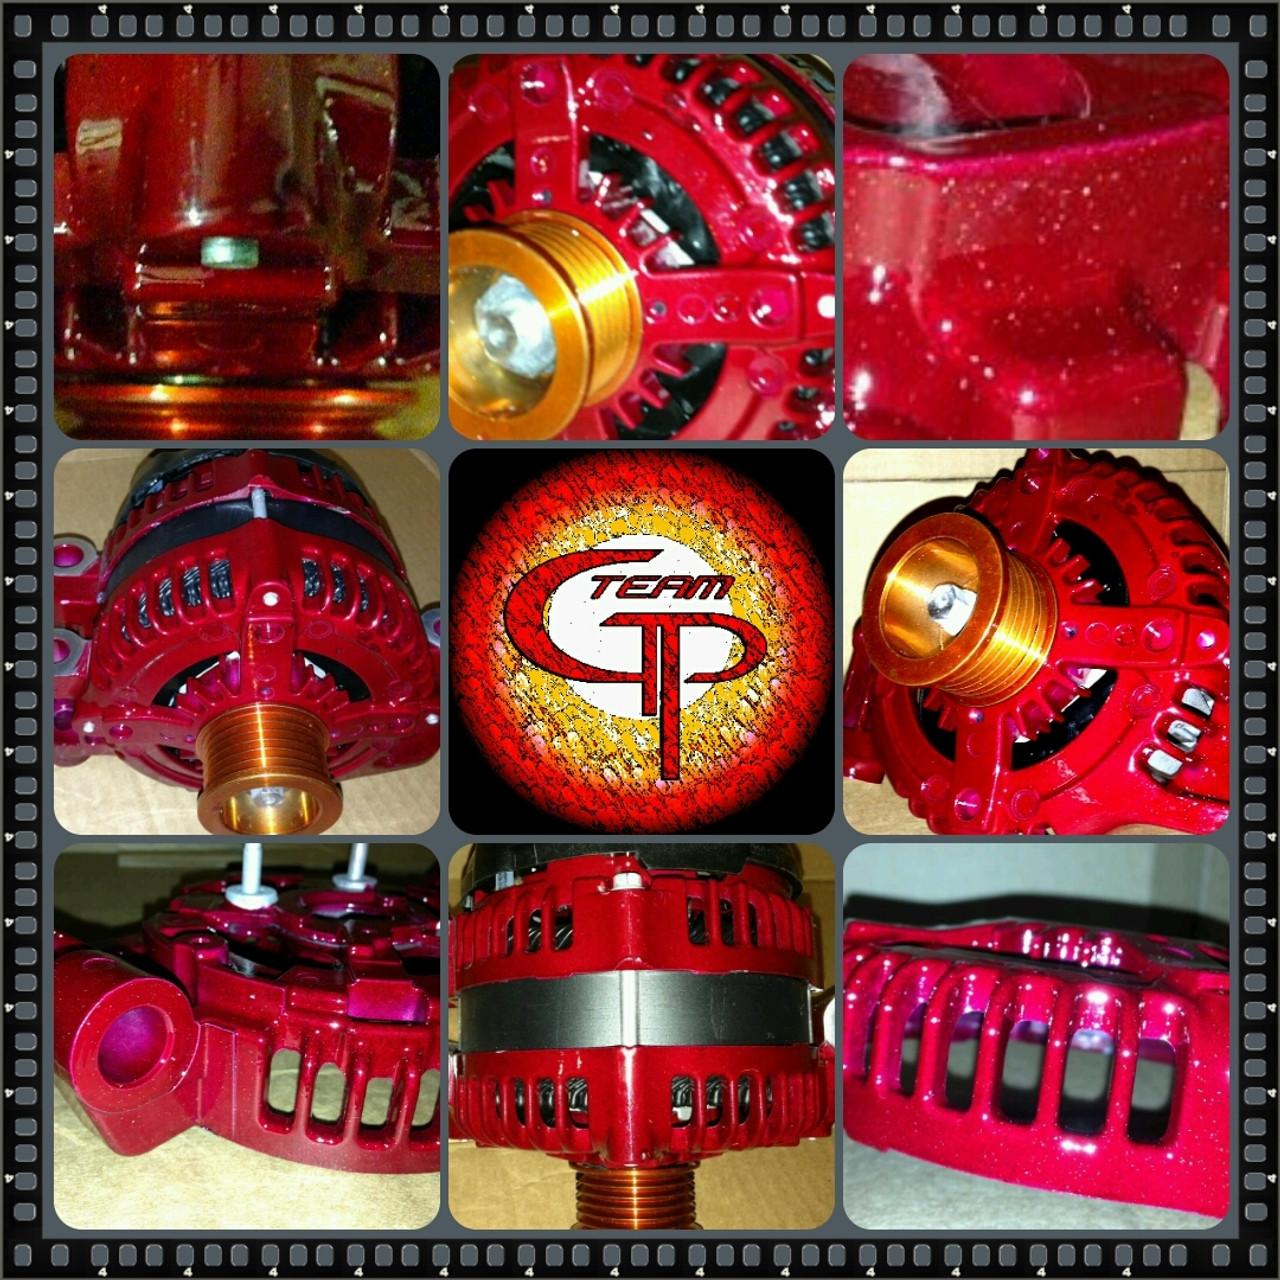 DODGE NEON 2.4L TURBO -2004-2005- 300AMP TEAM GP Alternator